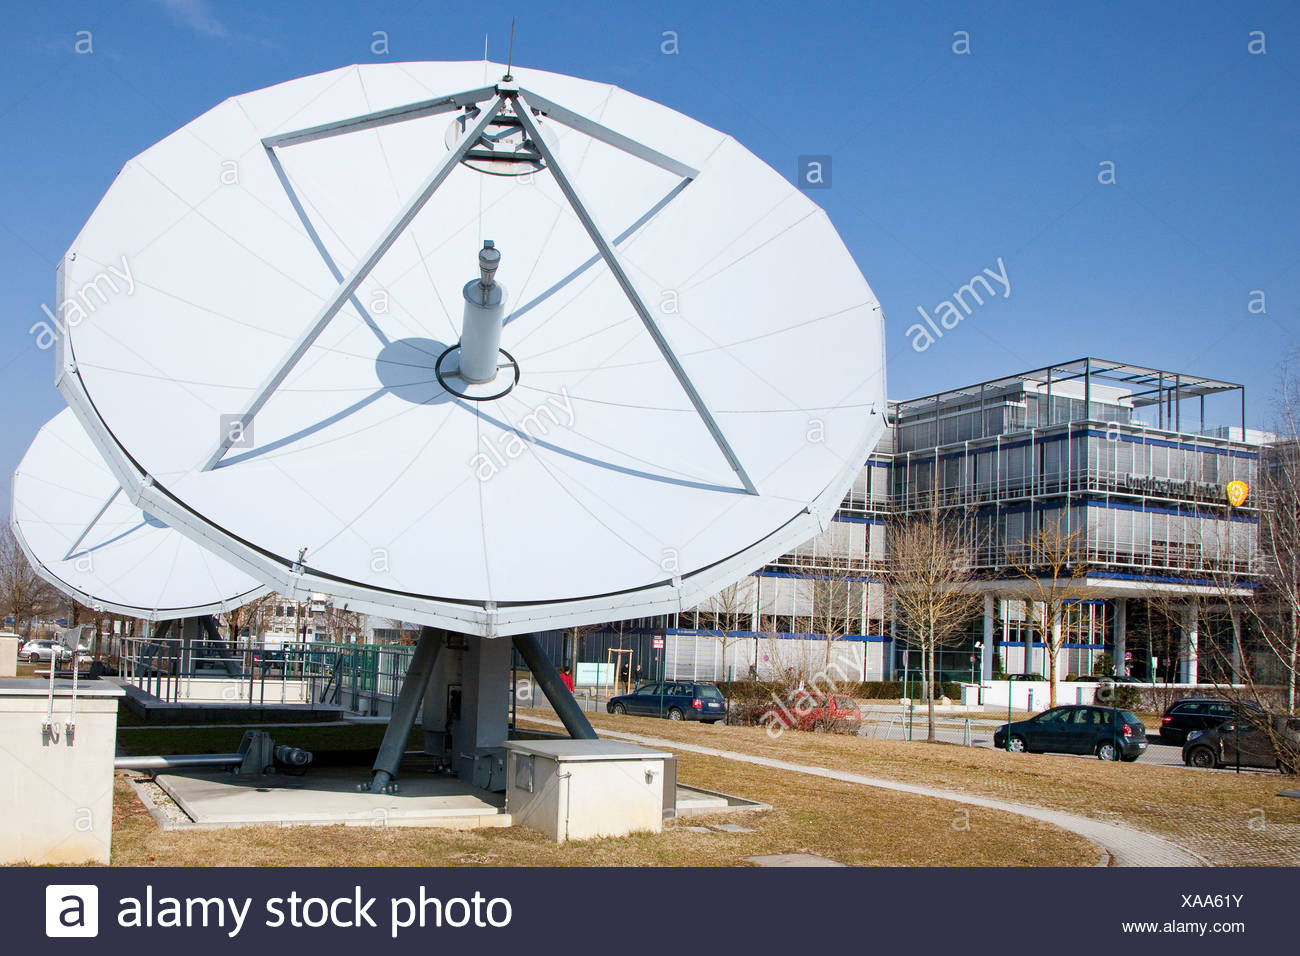 satellite dish stockfotos satellite dish bilder seite. Black Bedroom Furniture Sets. Home Design Ideas